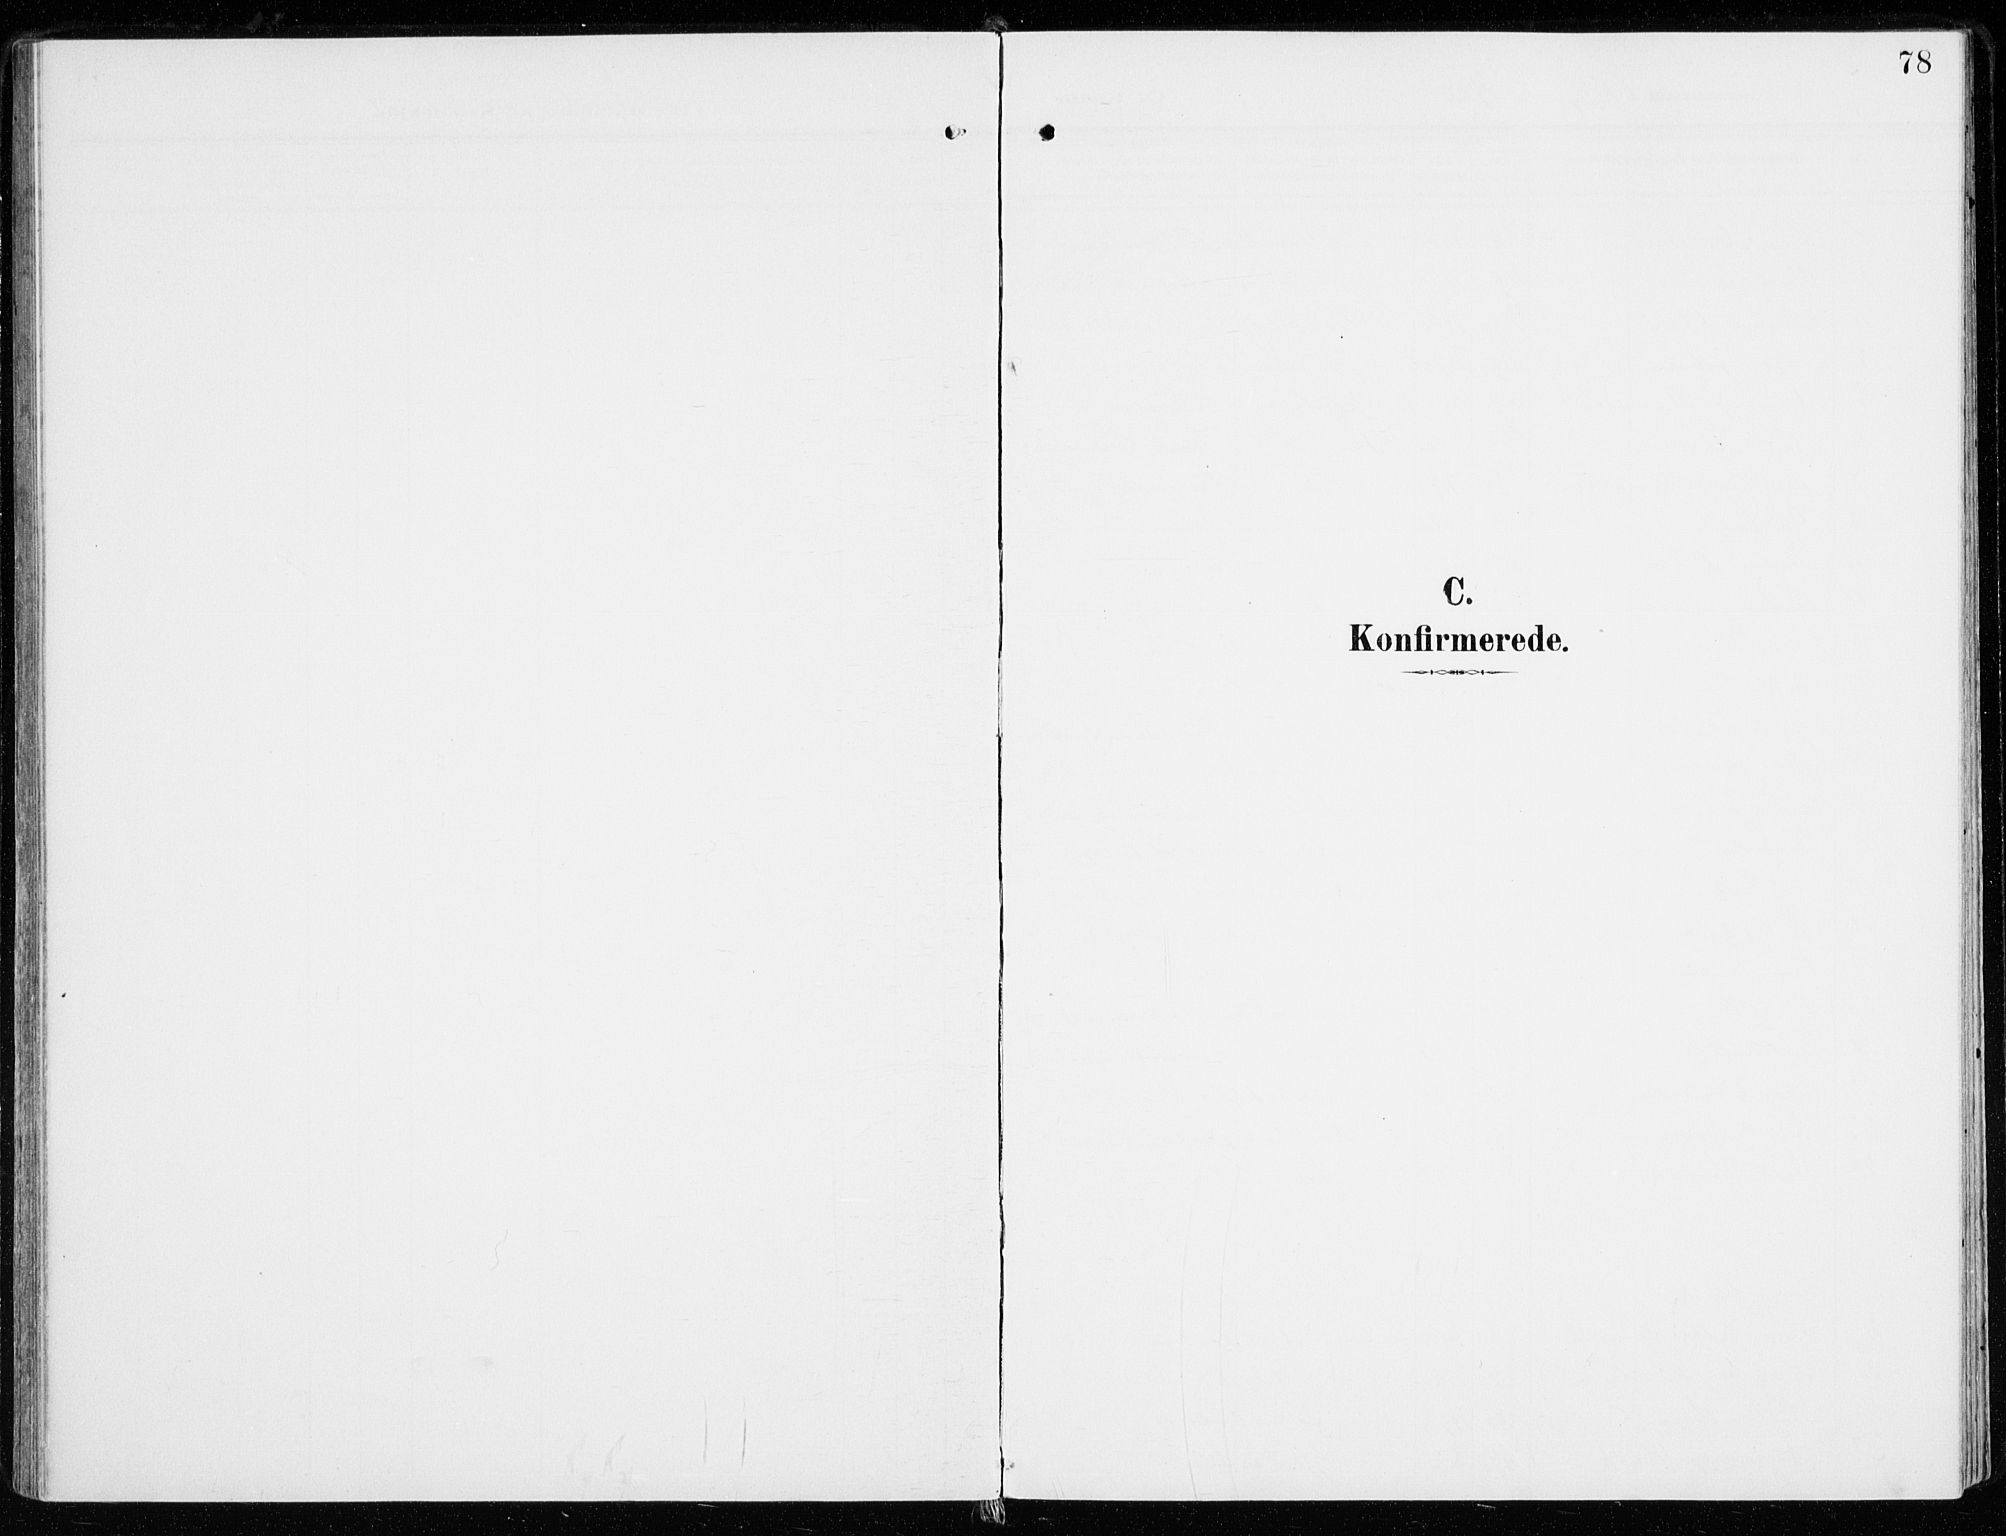 SAH, Sel prestekontor, Ministerialbok nr. 2, 1905-1919, s. 78